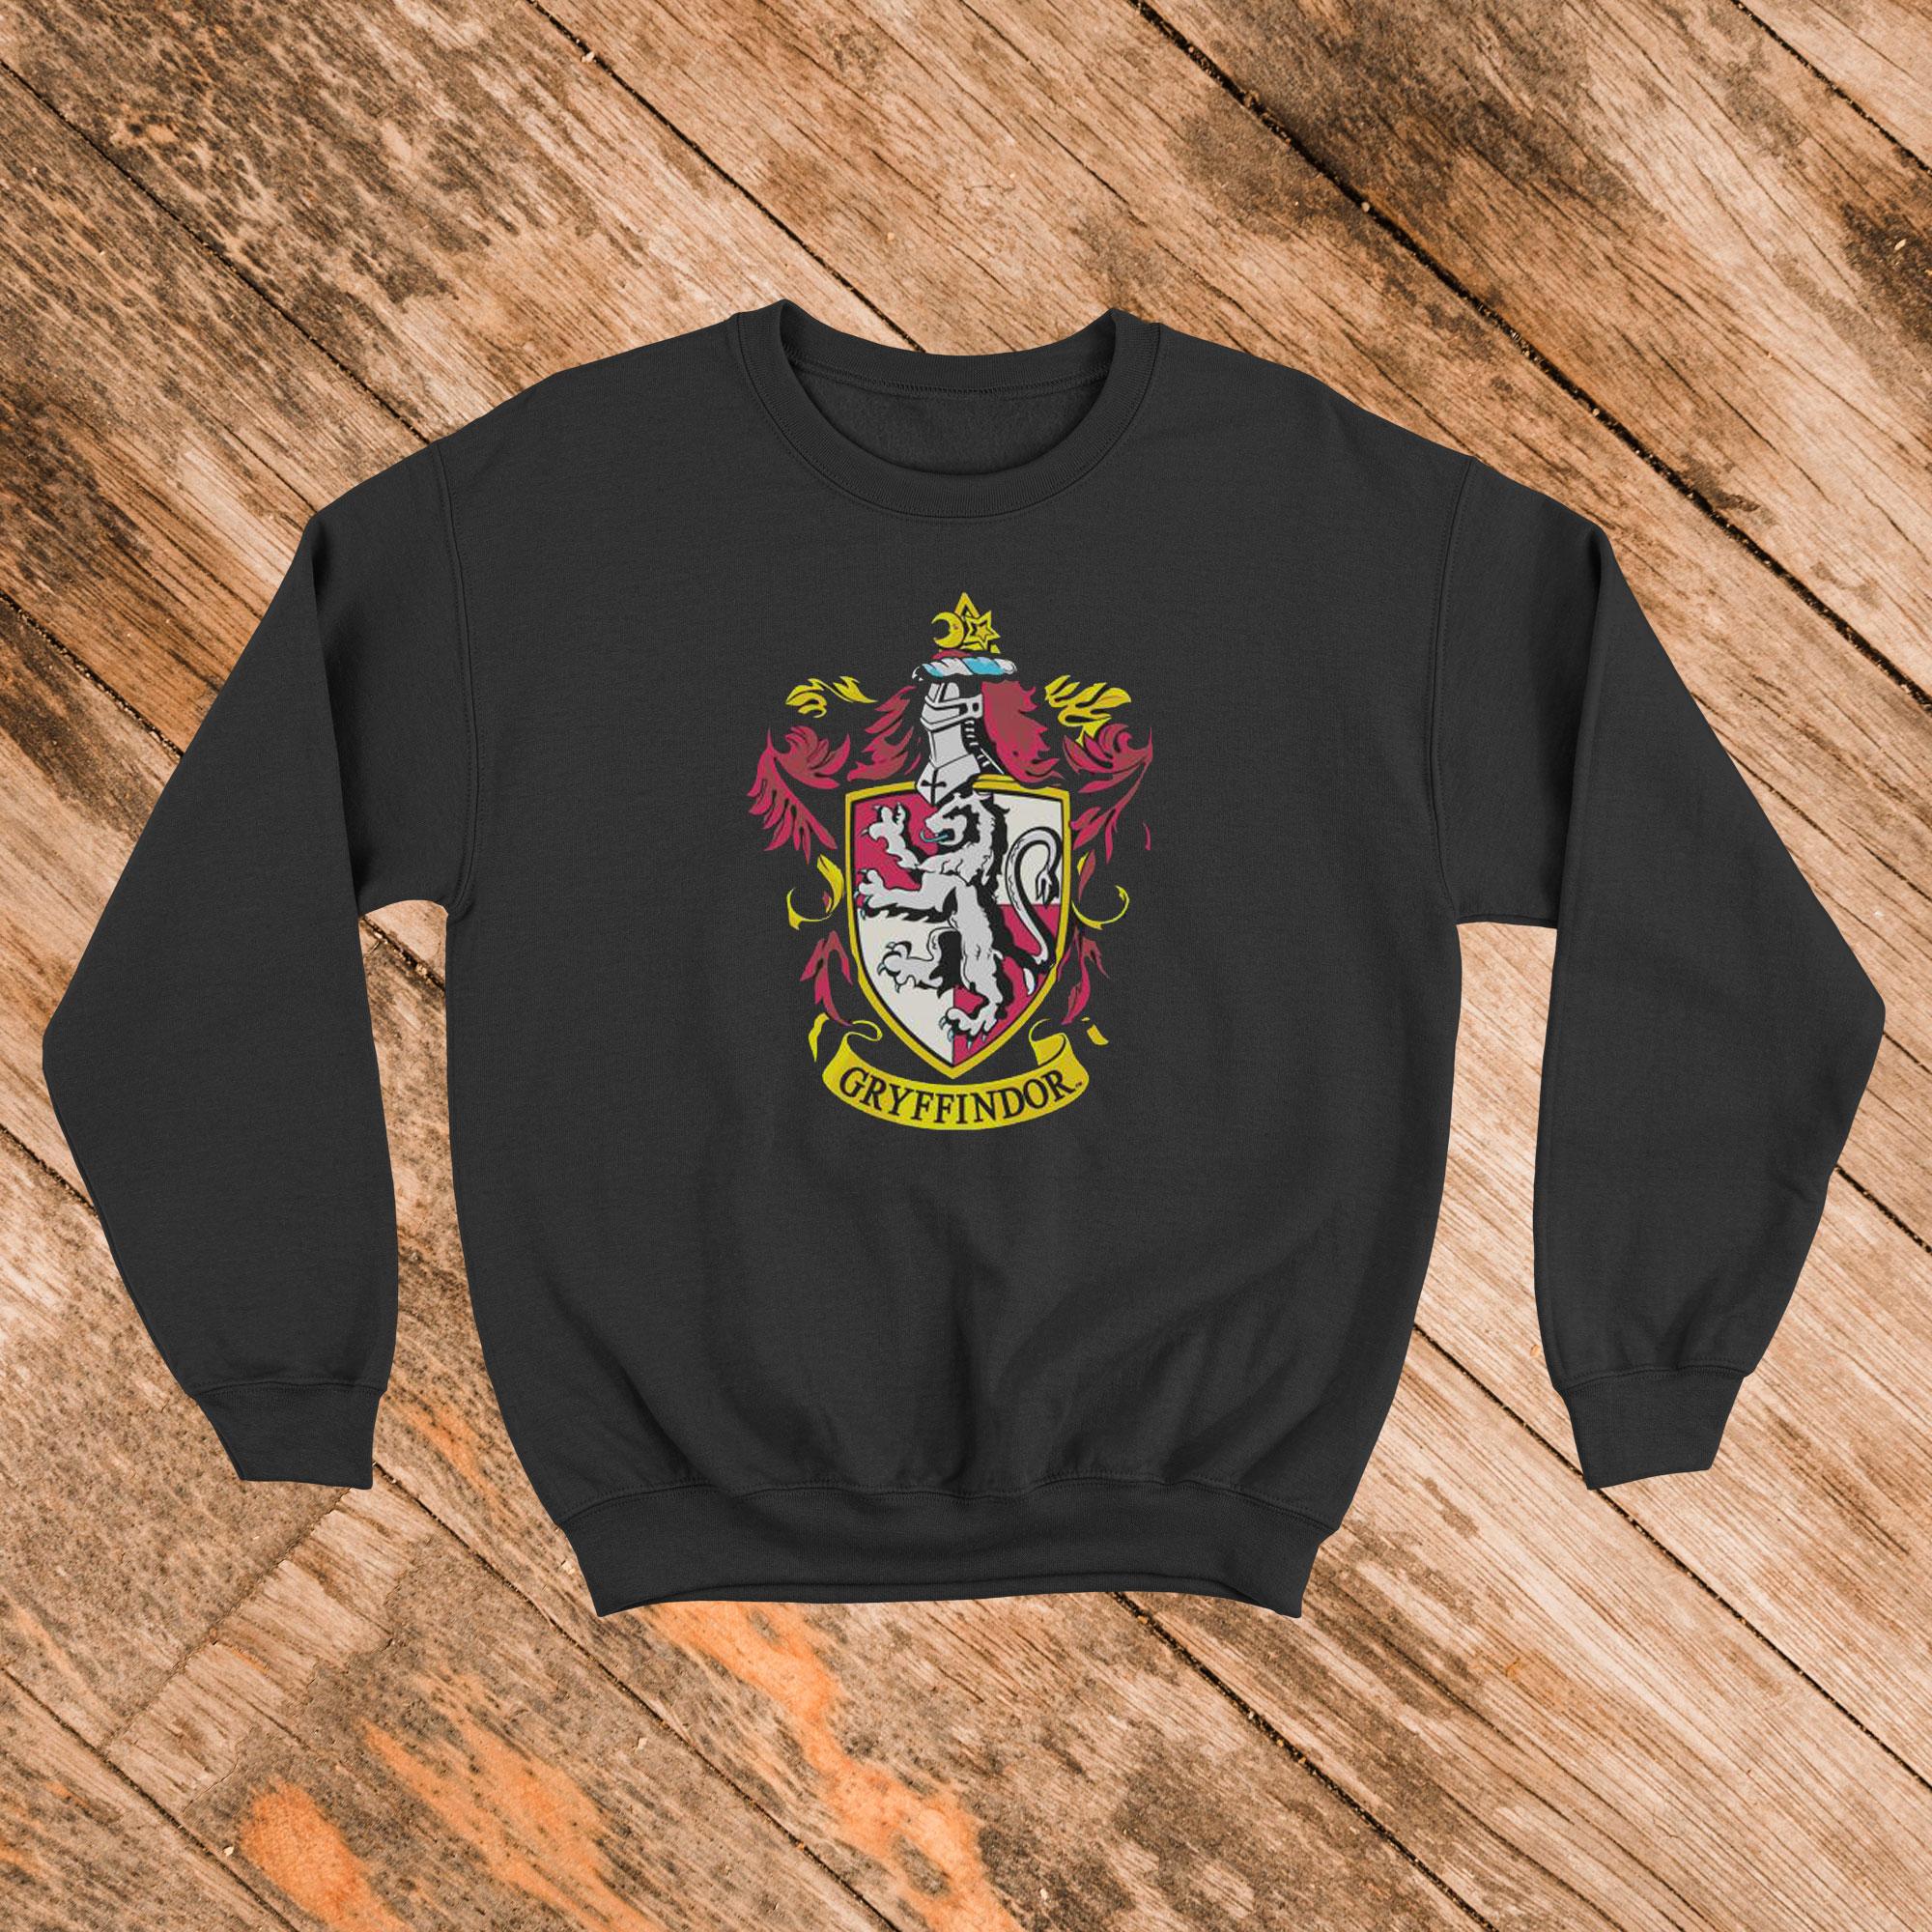 Gryffindor Harry Potter Sweatshirts